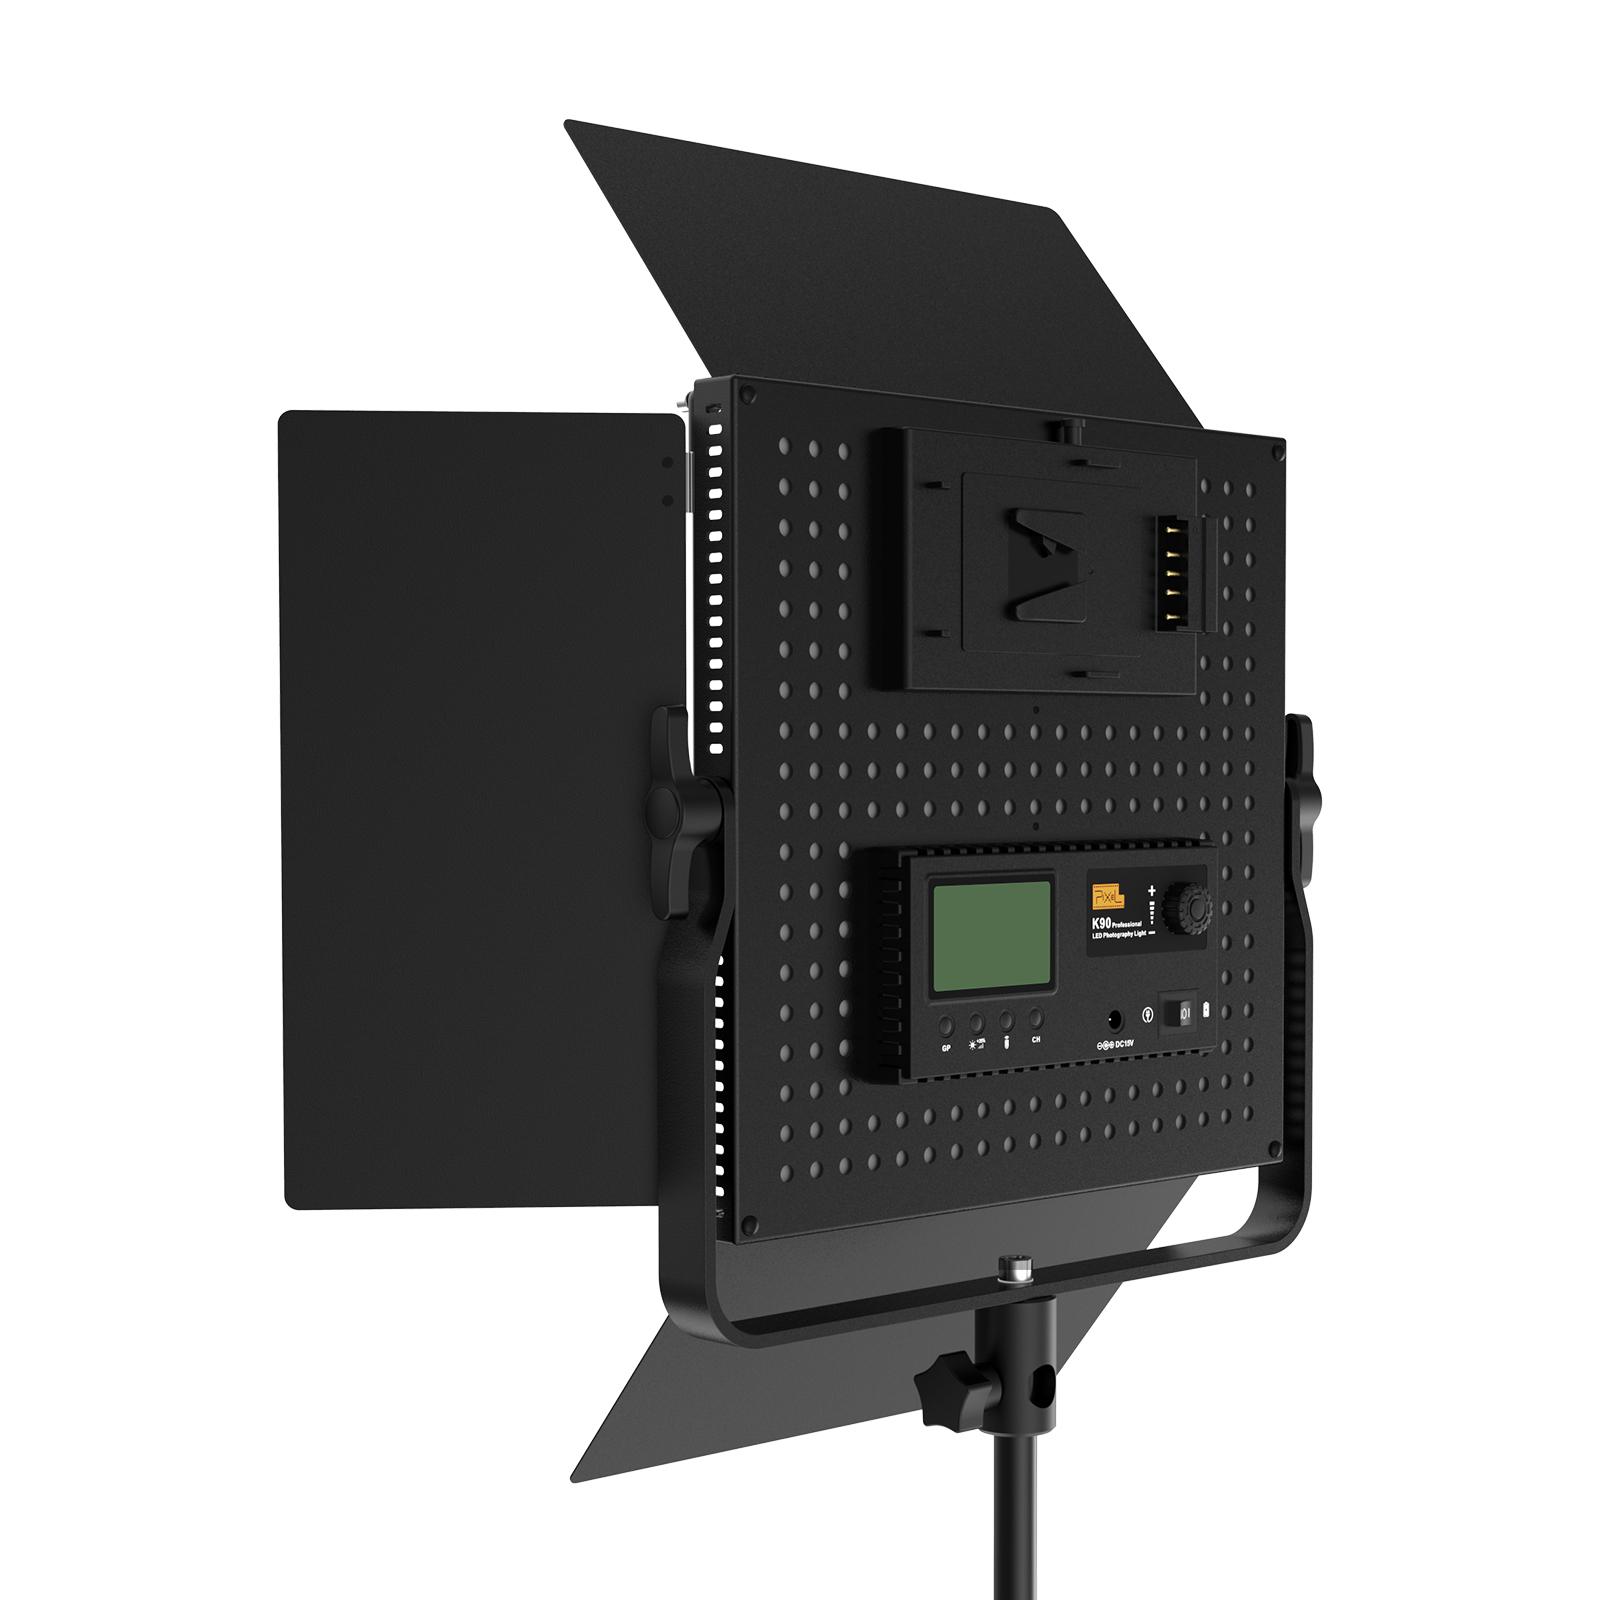 Plxel K90S RGB Metal Light, Gathering light Reflector, brightness upgrade, bi-color temperature and Stepless Adjusted.